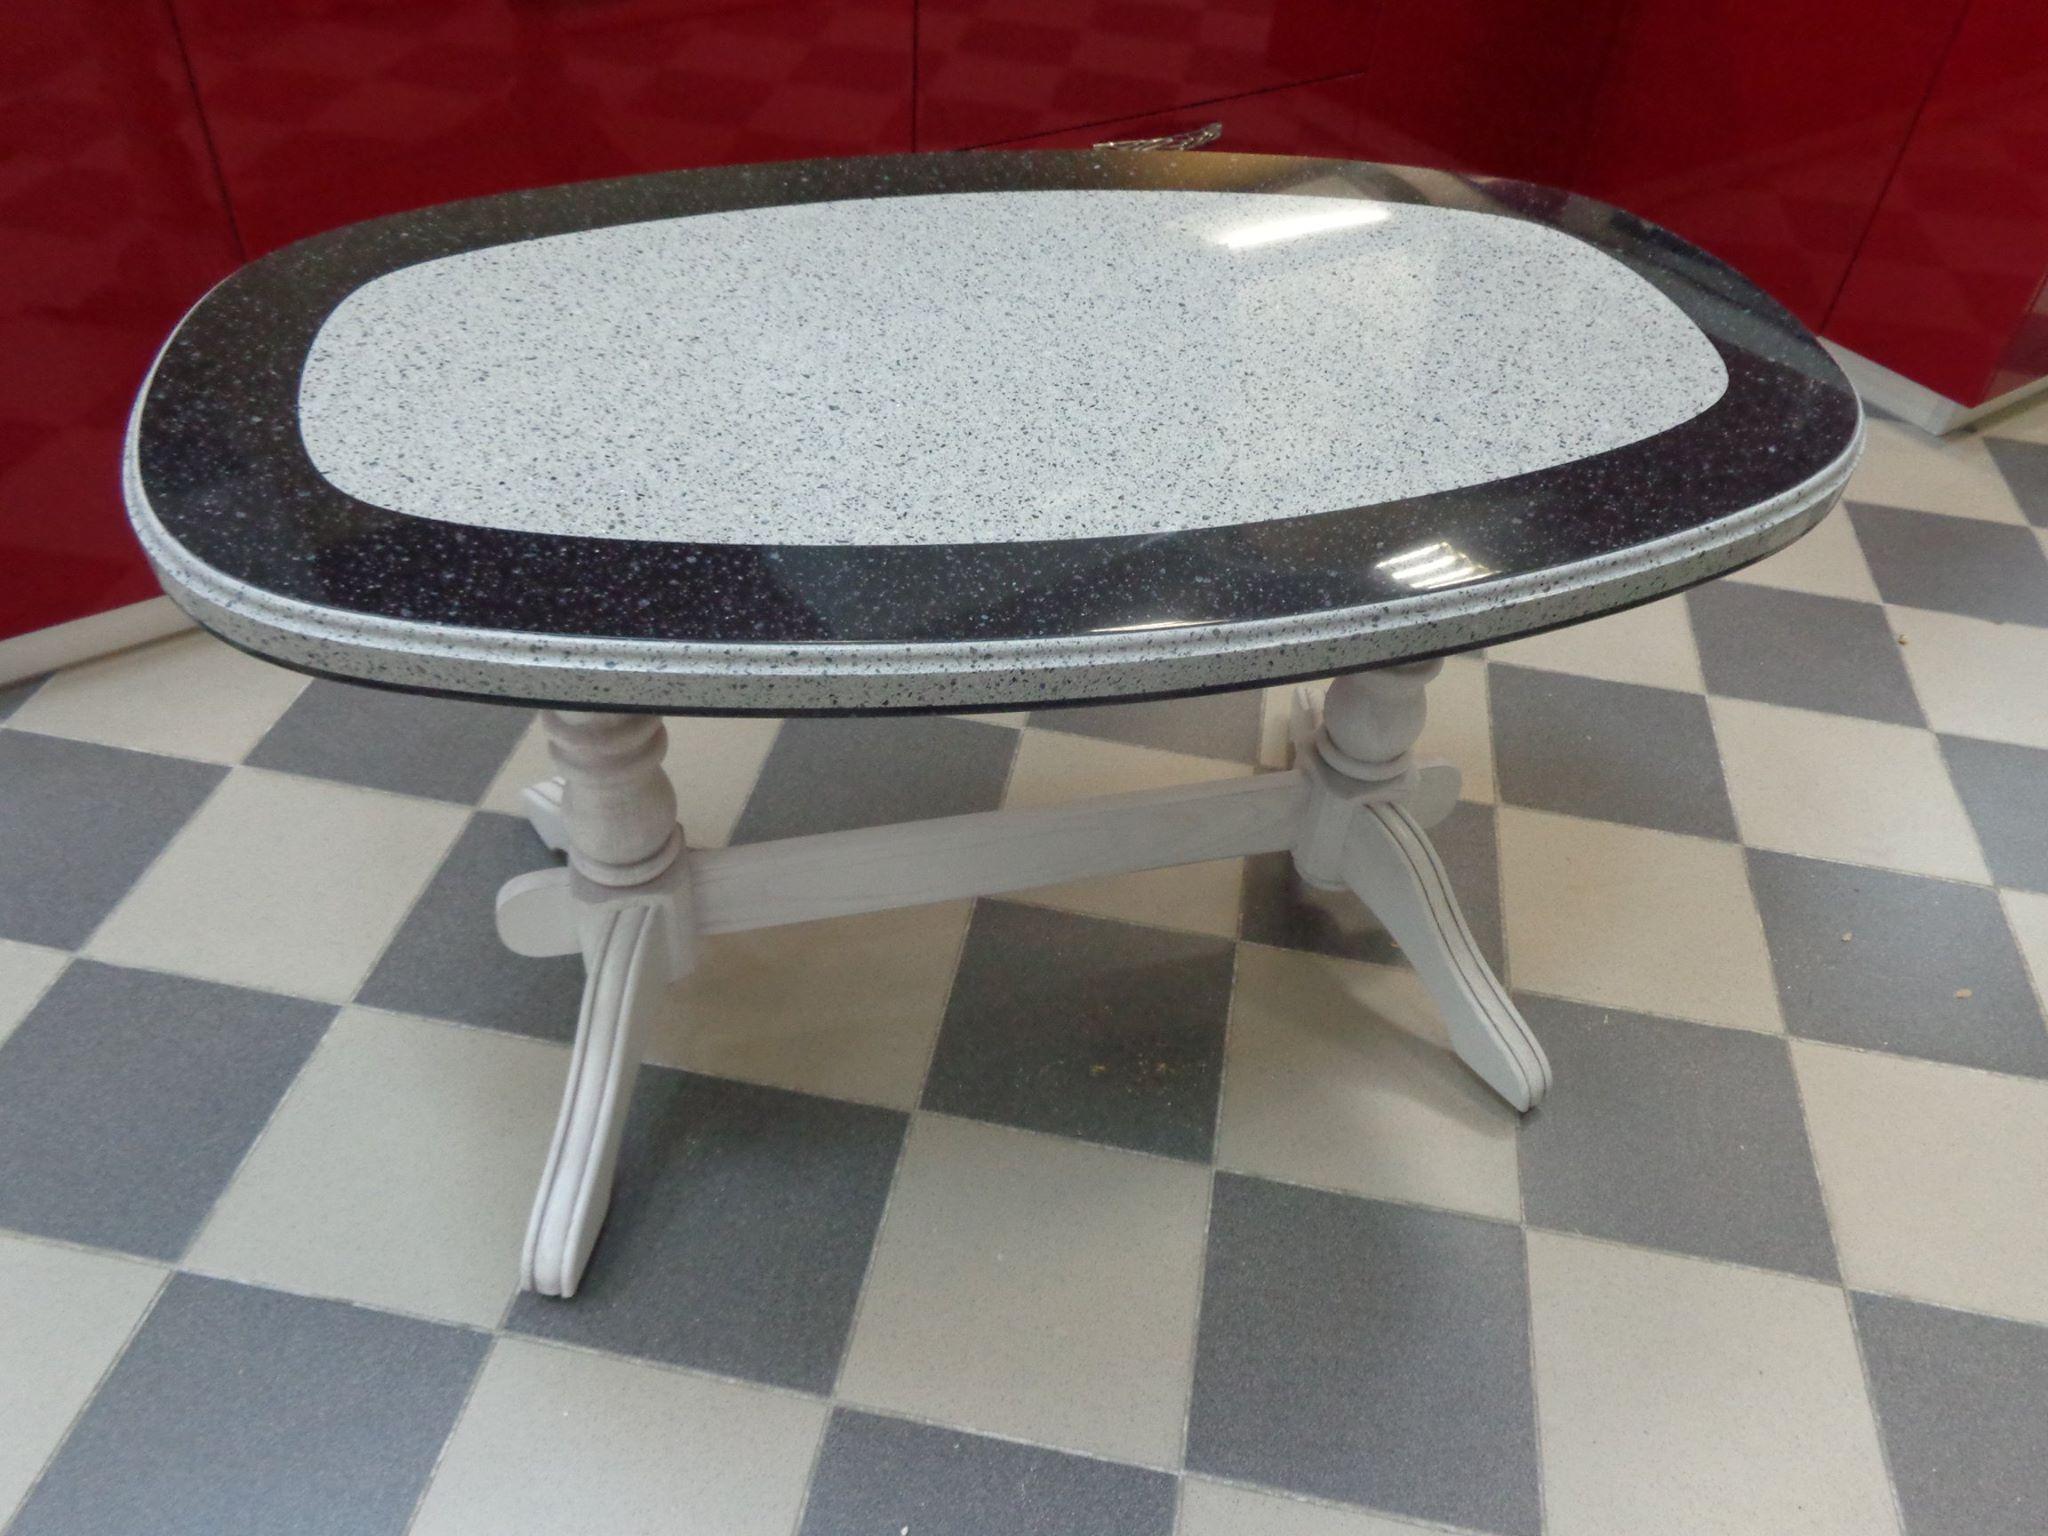 обеденный стол из камня.jpg